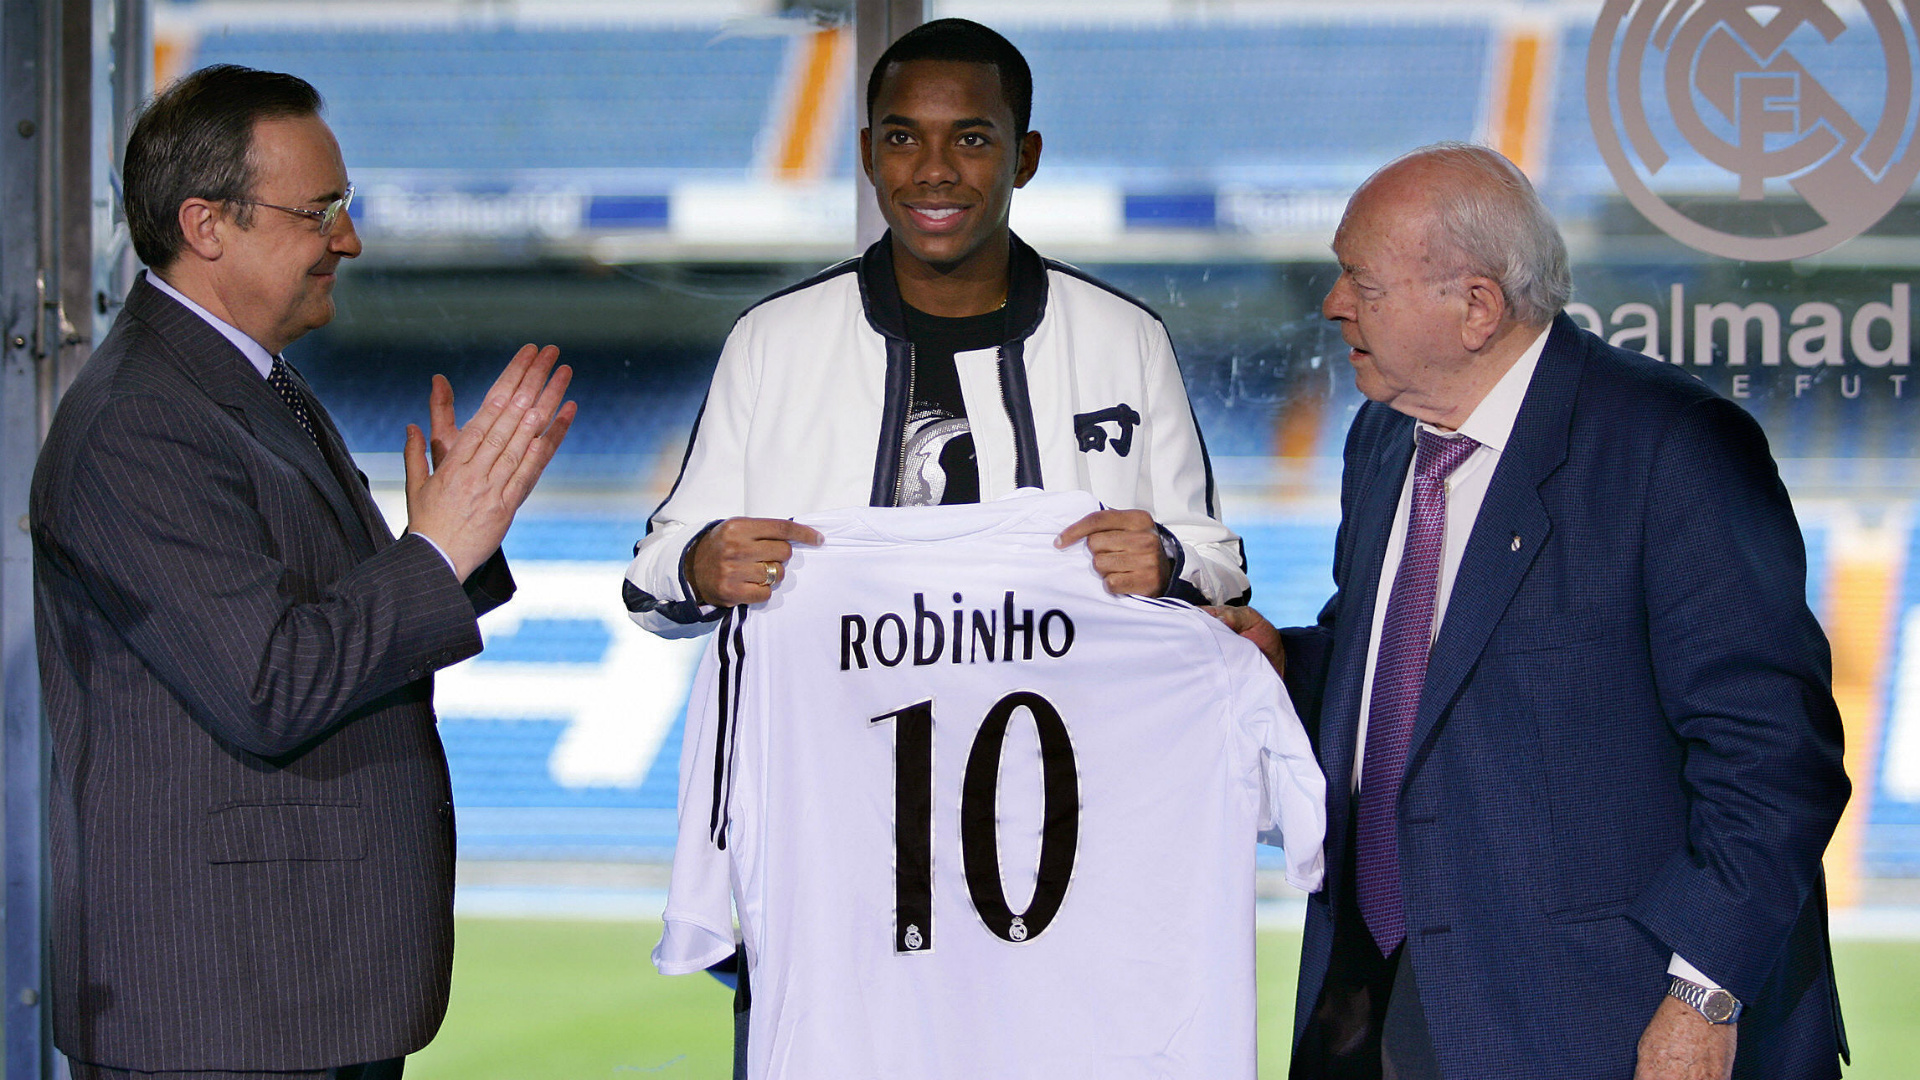 Robinho ex Real Madrid player